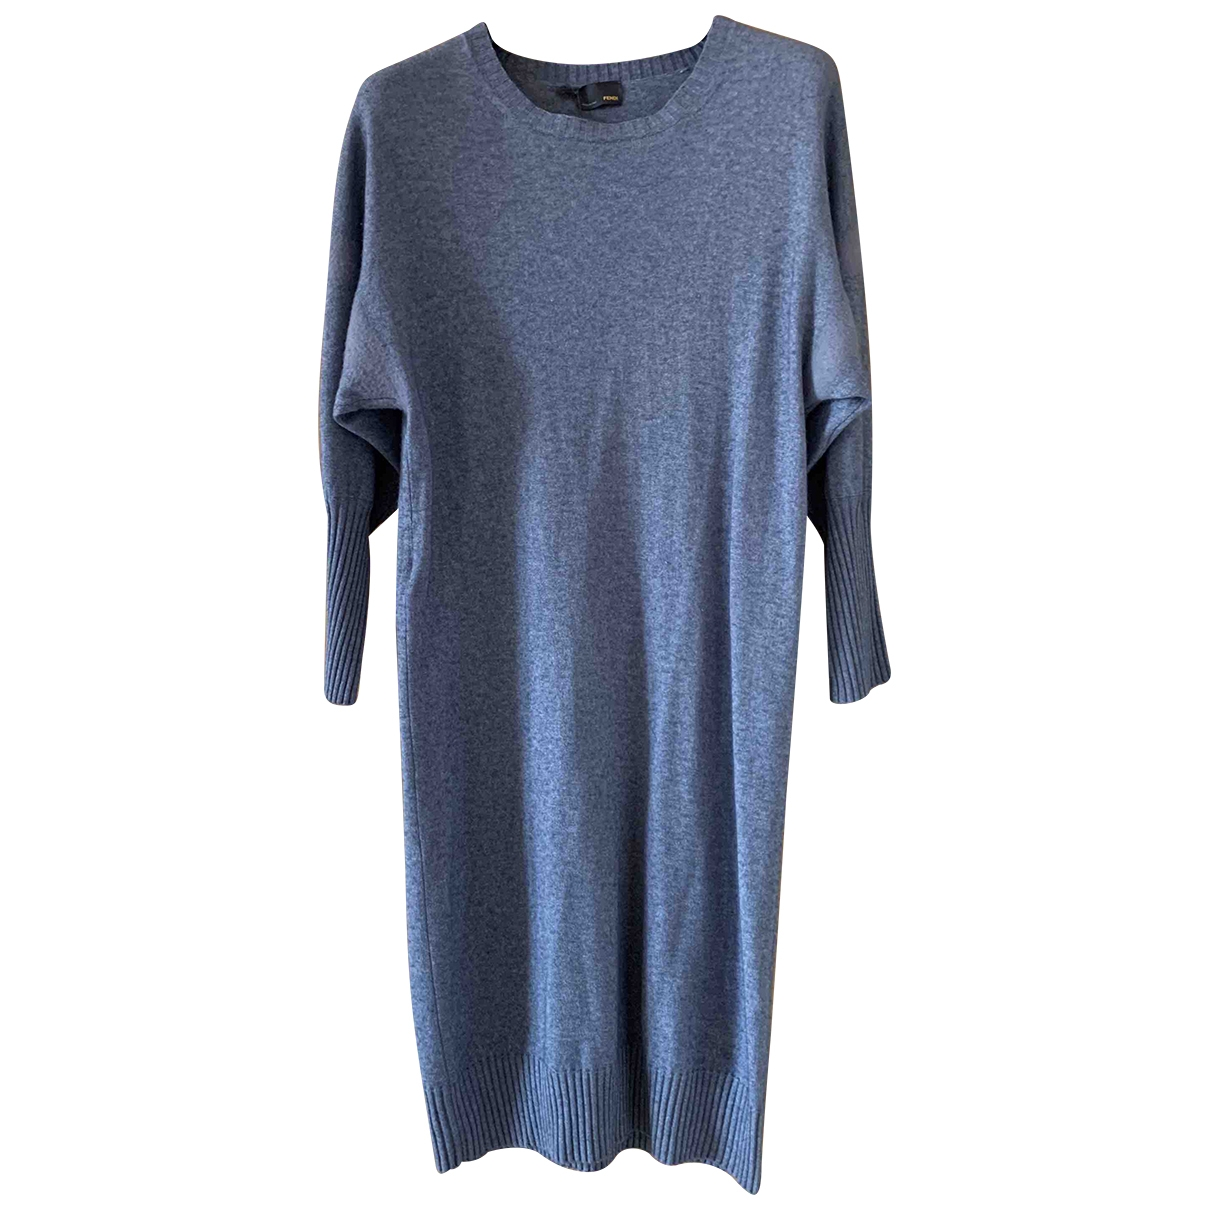 Fendi \N Blue Cashmere dress for Women 36 IT